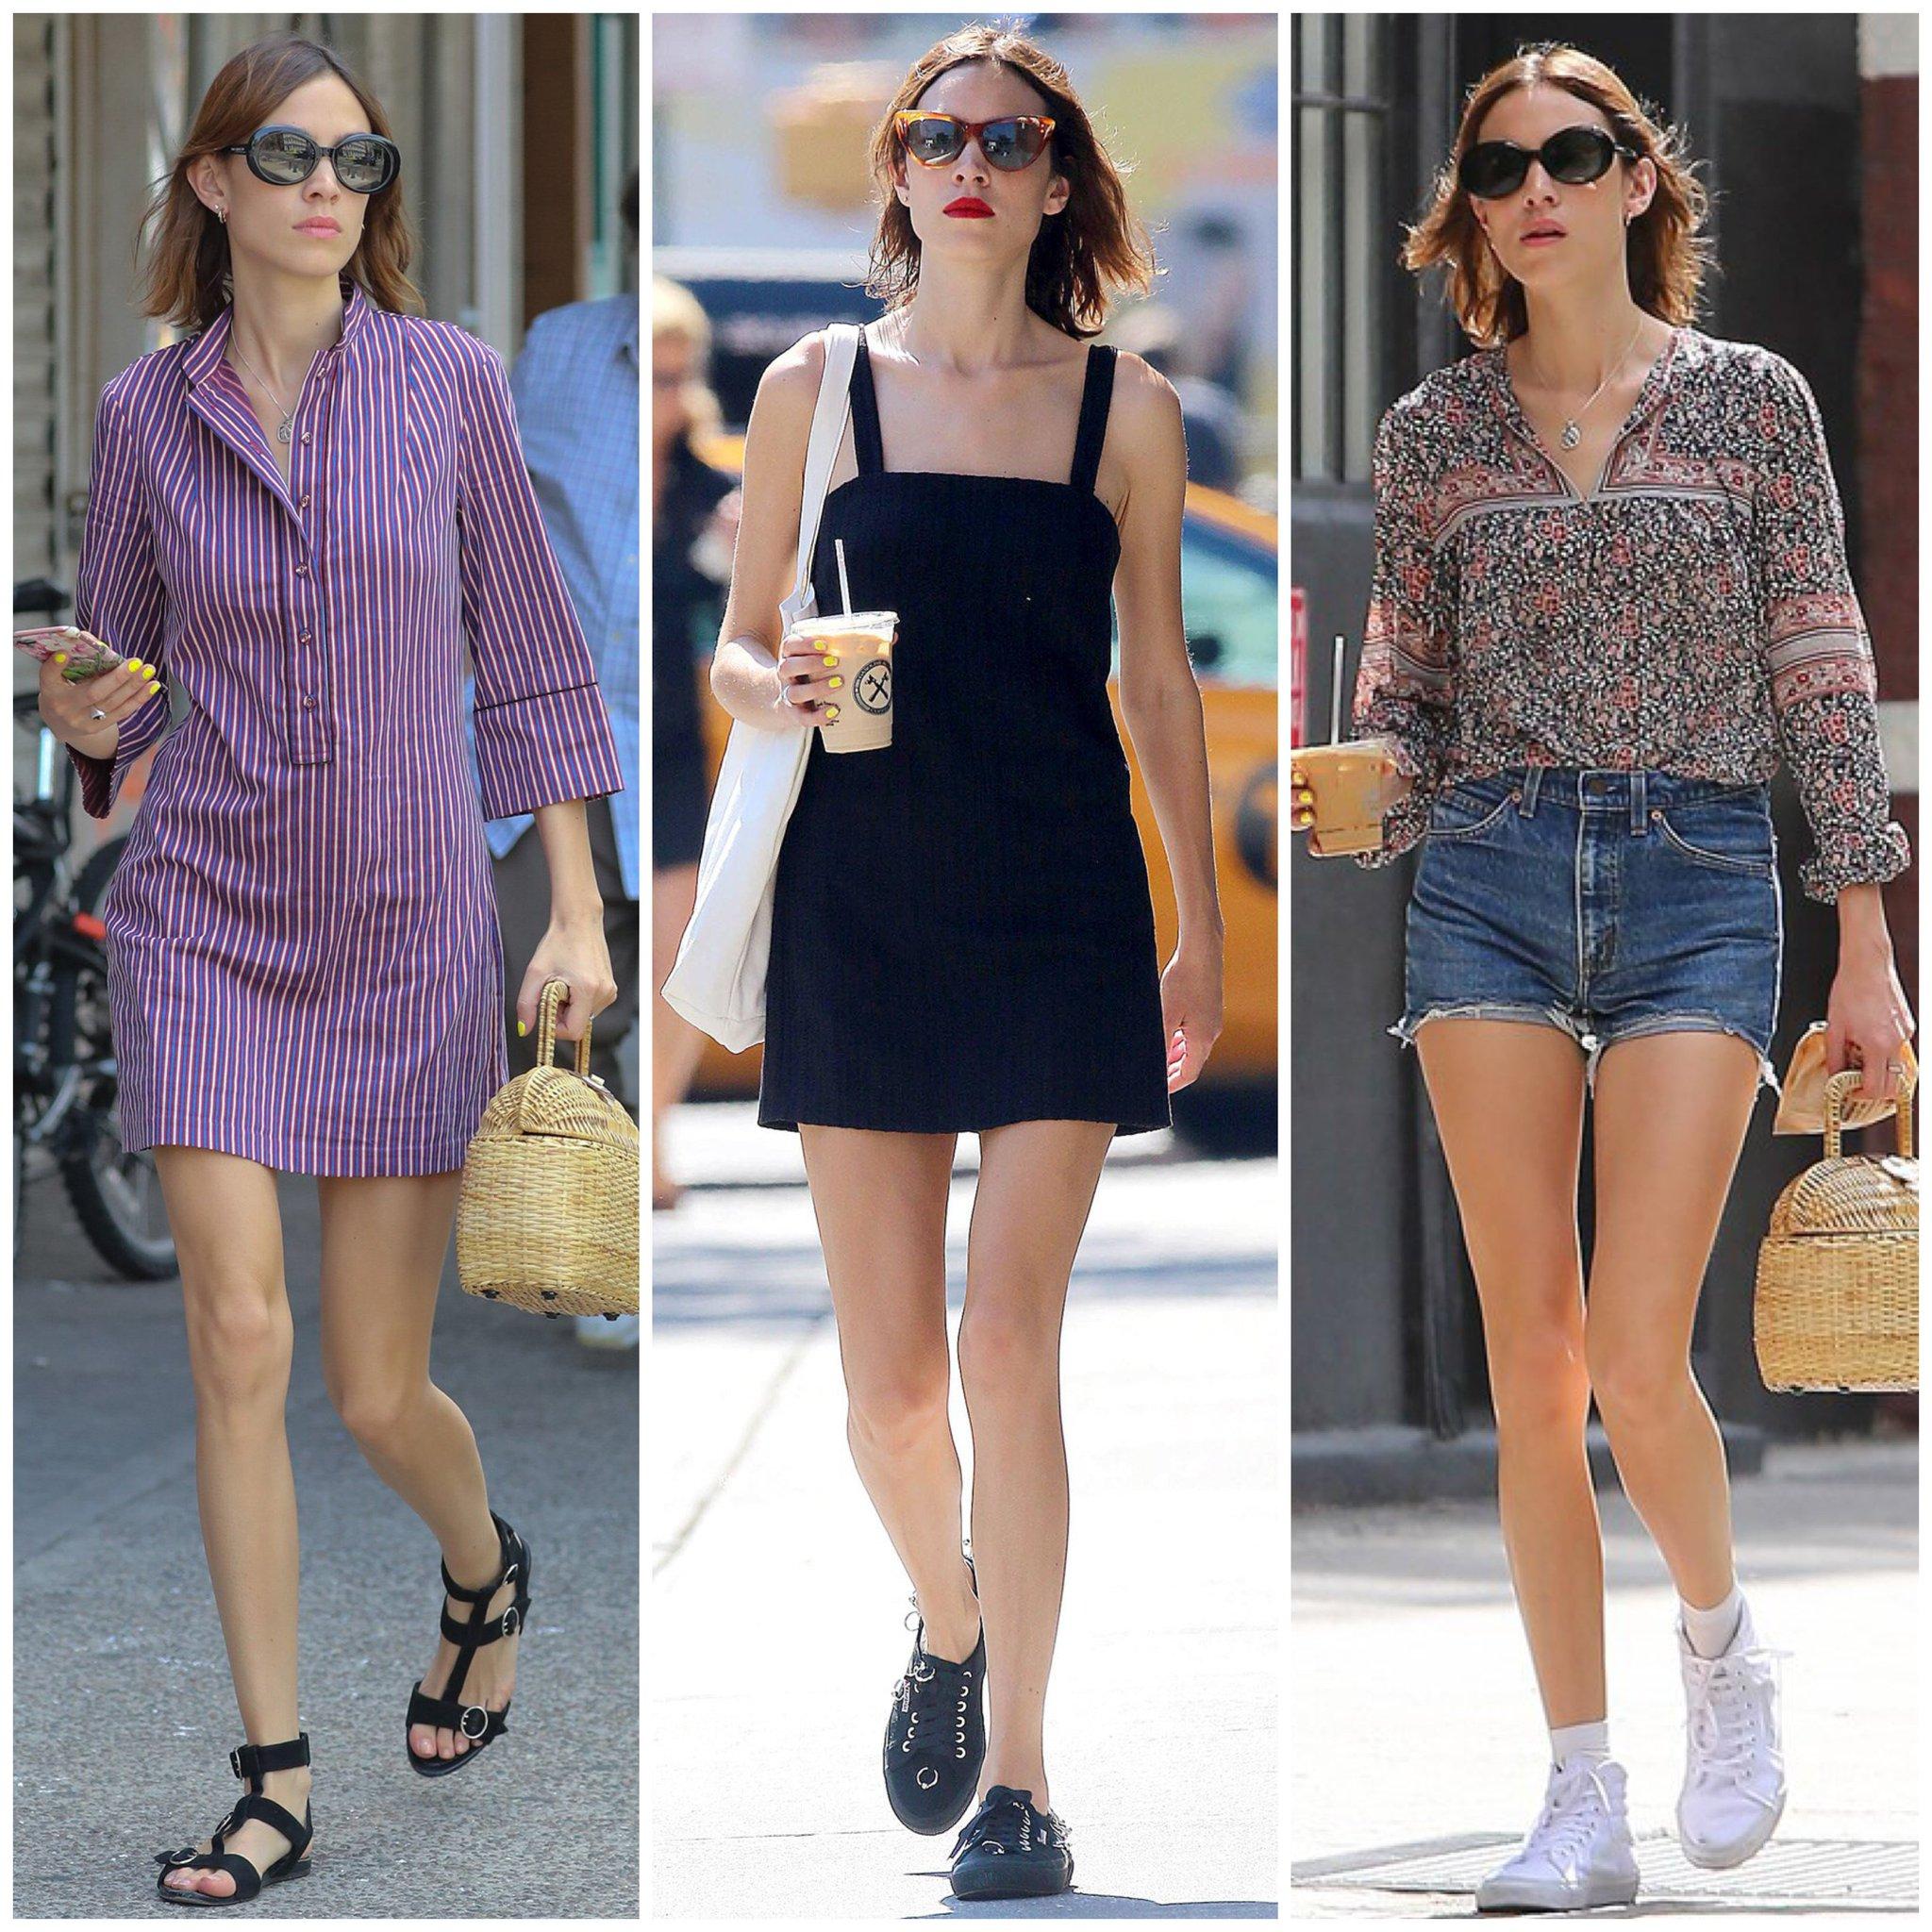 As she showcases her summer wardrobe this week, we chart Alexa's style evolution: https://t.co/FhbraACaei https://t.co/Hp5NtmrWjc